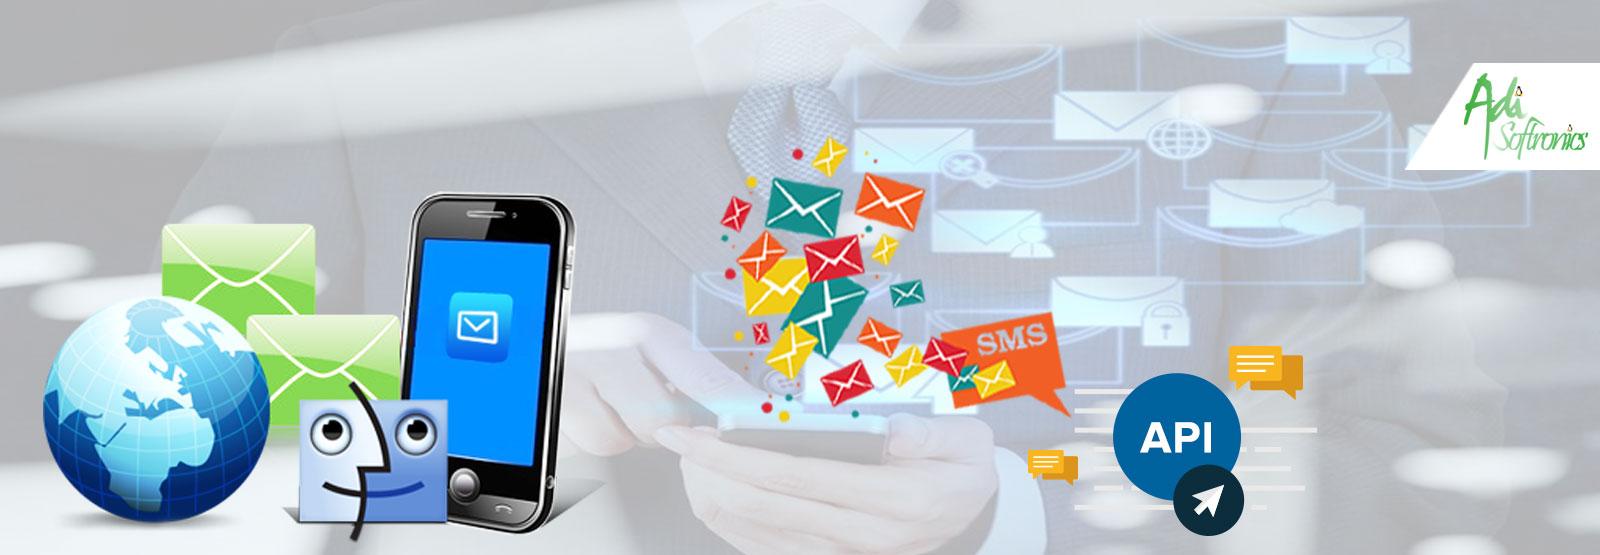 SMS API Integration Service